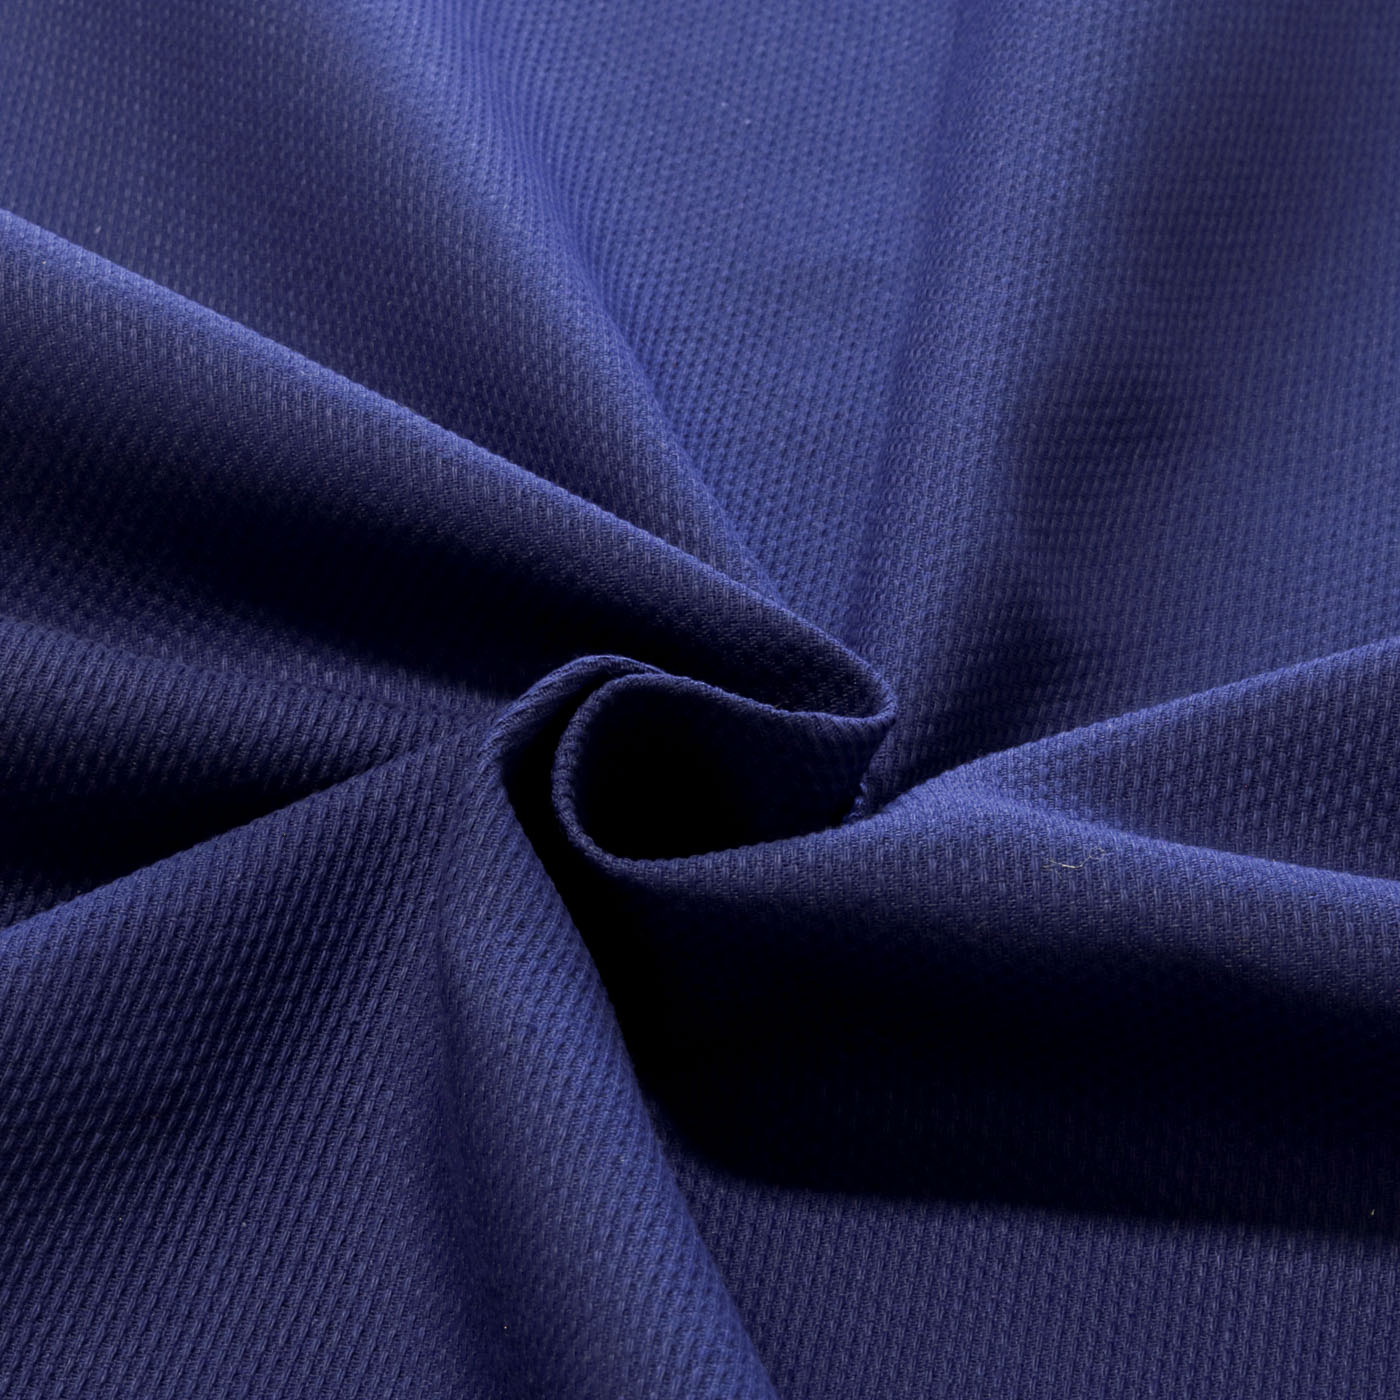 Tecido Vagonite 100% Algodao 1,50 Mt Largura Azul Royal